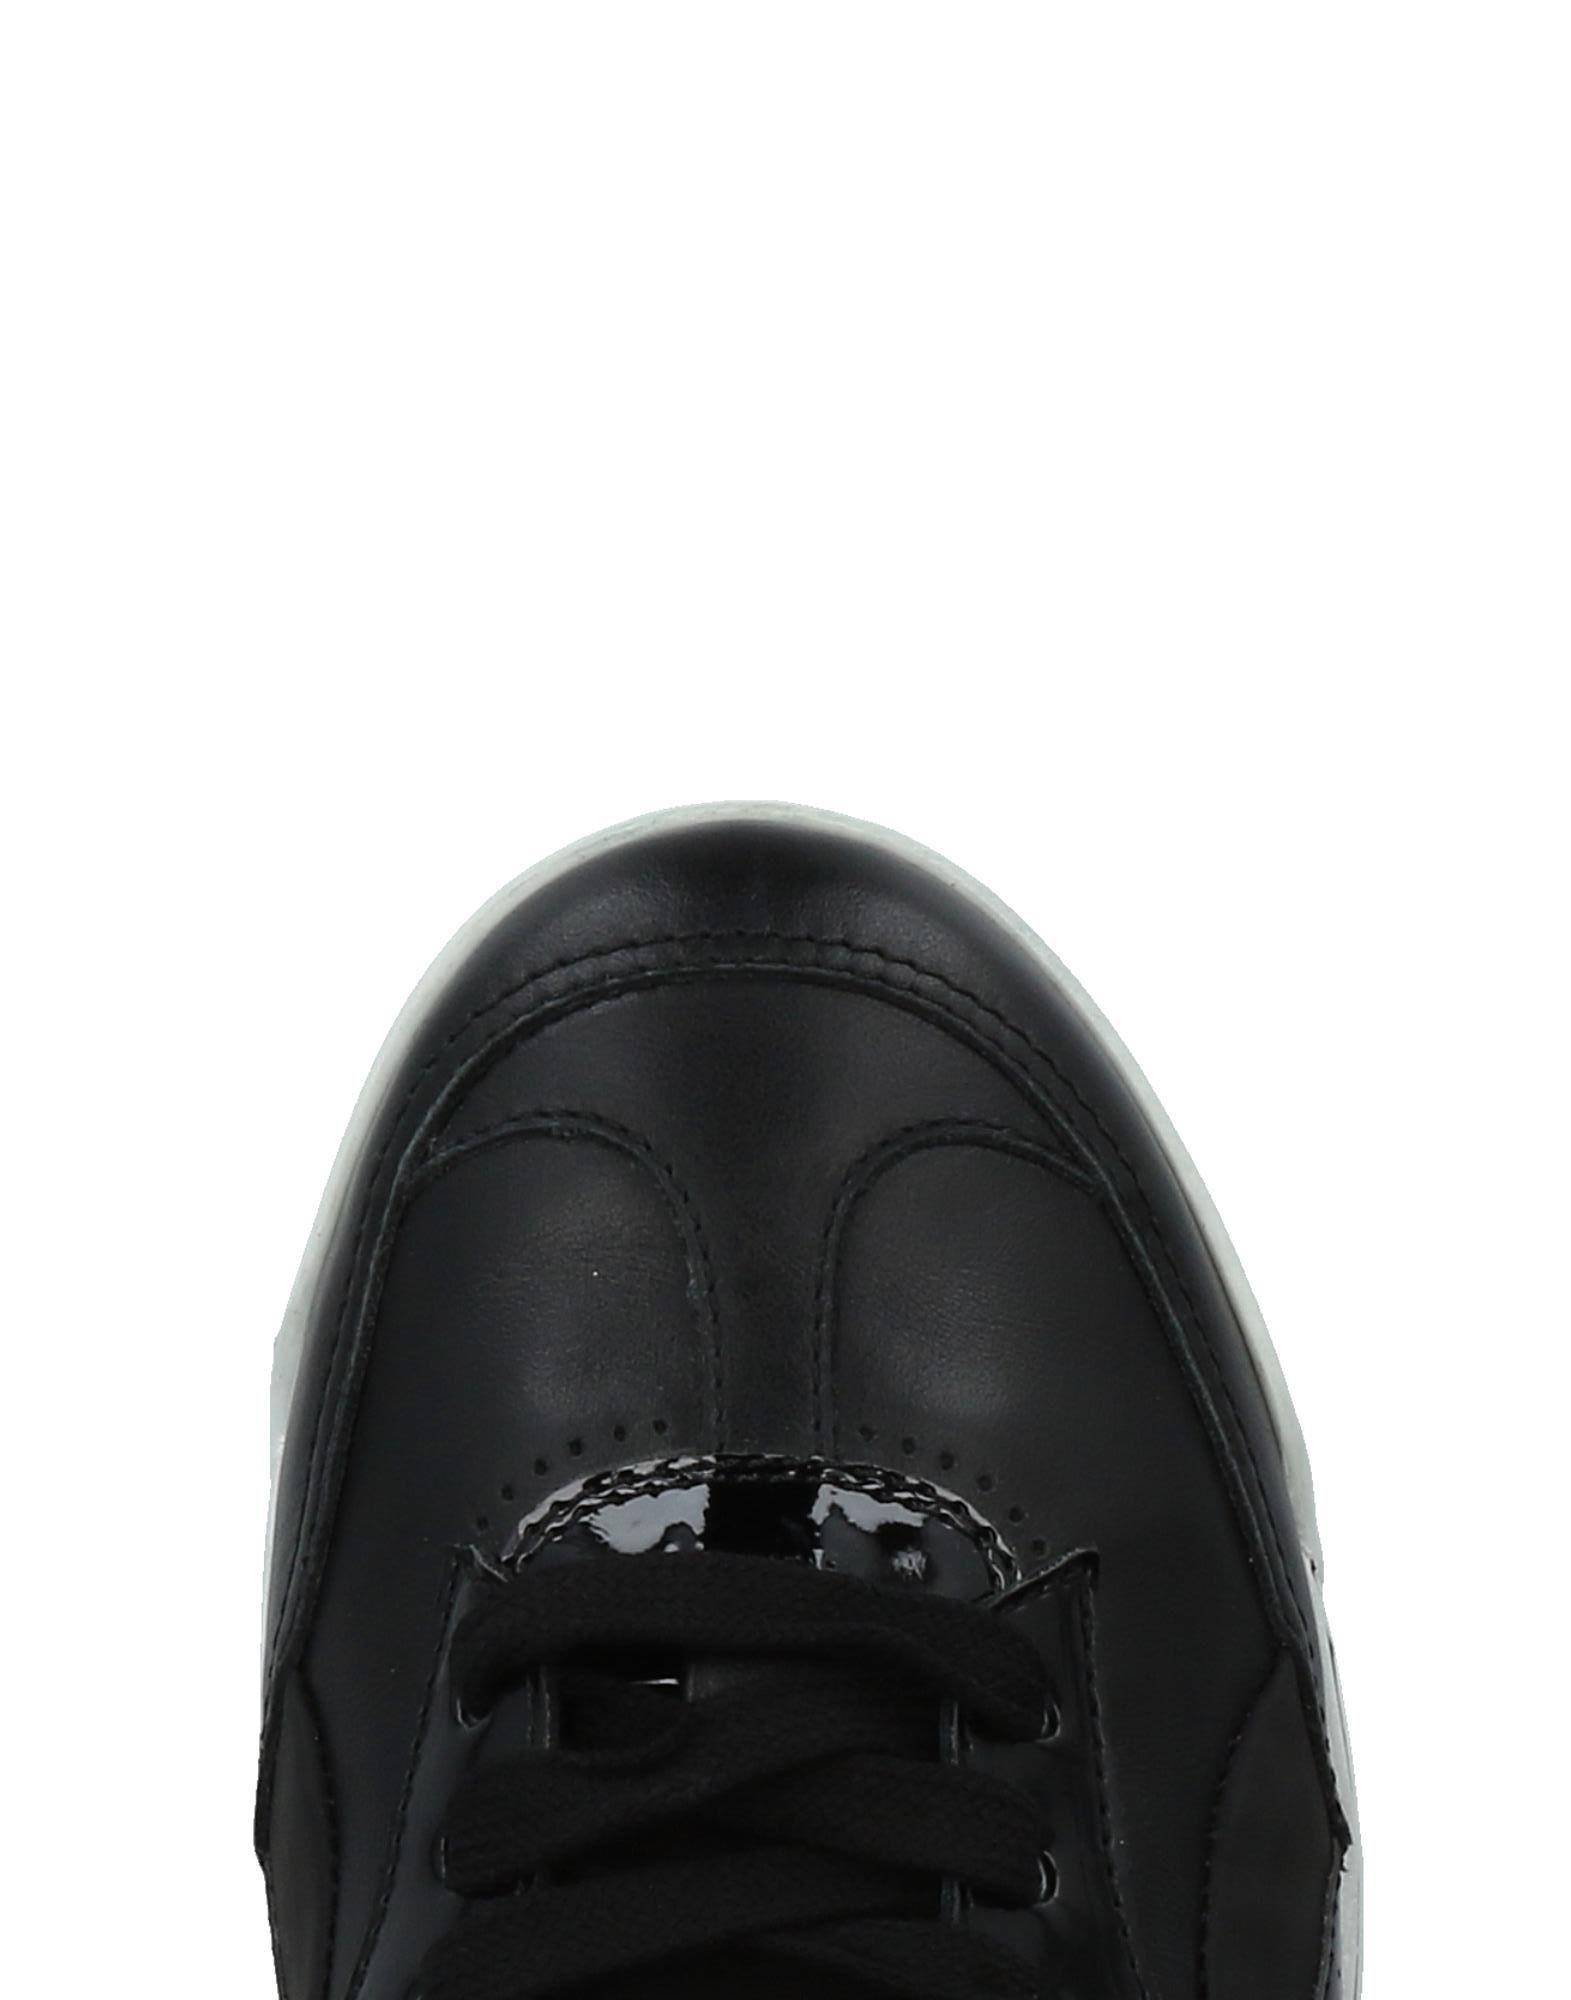 Dsquared2 Sneakers Herren  11422967LH Gute Qualität beliebte Schuhe